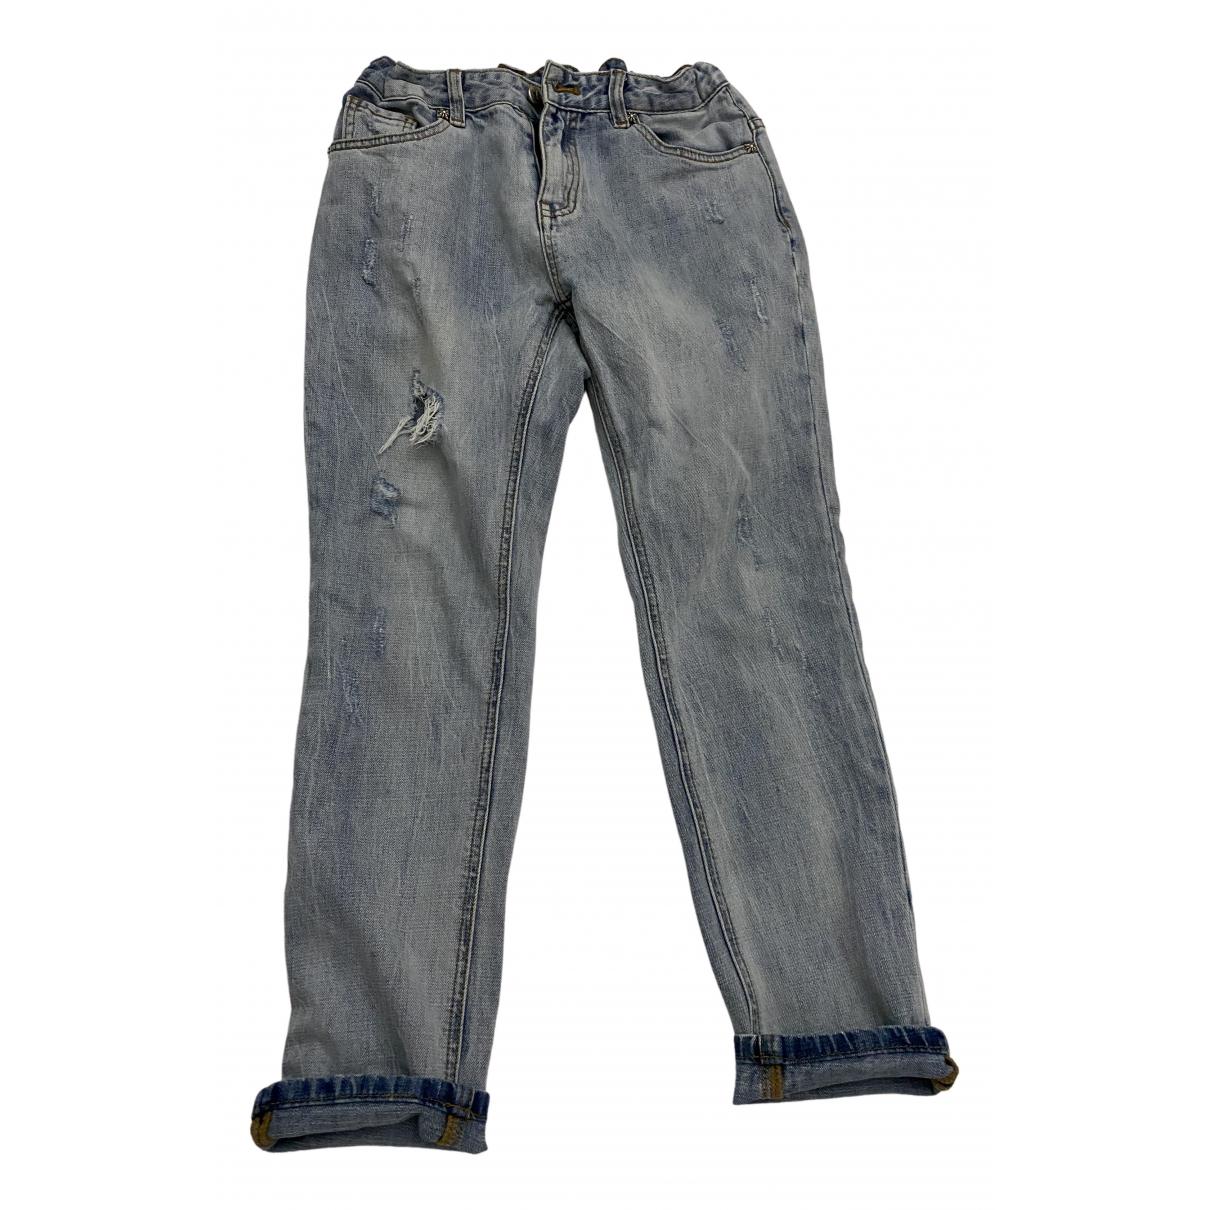 John Richmond N Blue Denim - Jeans Trousers for Kids 14 years - S UK